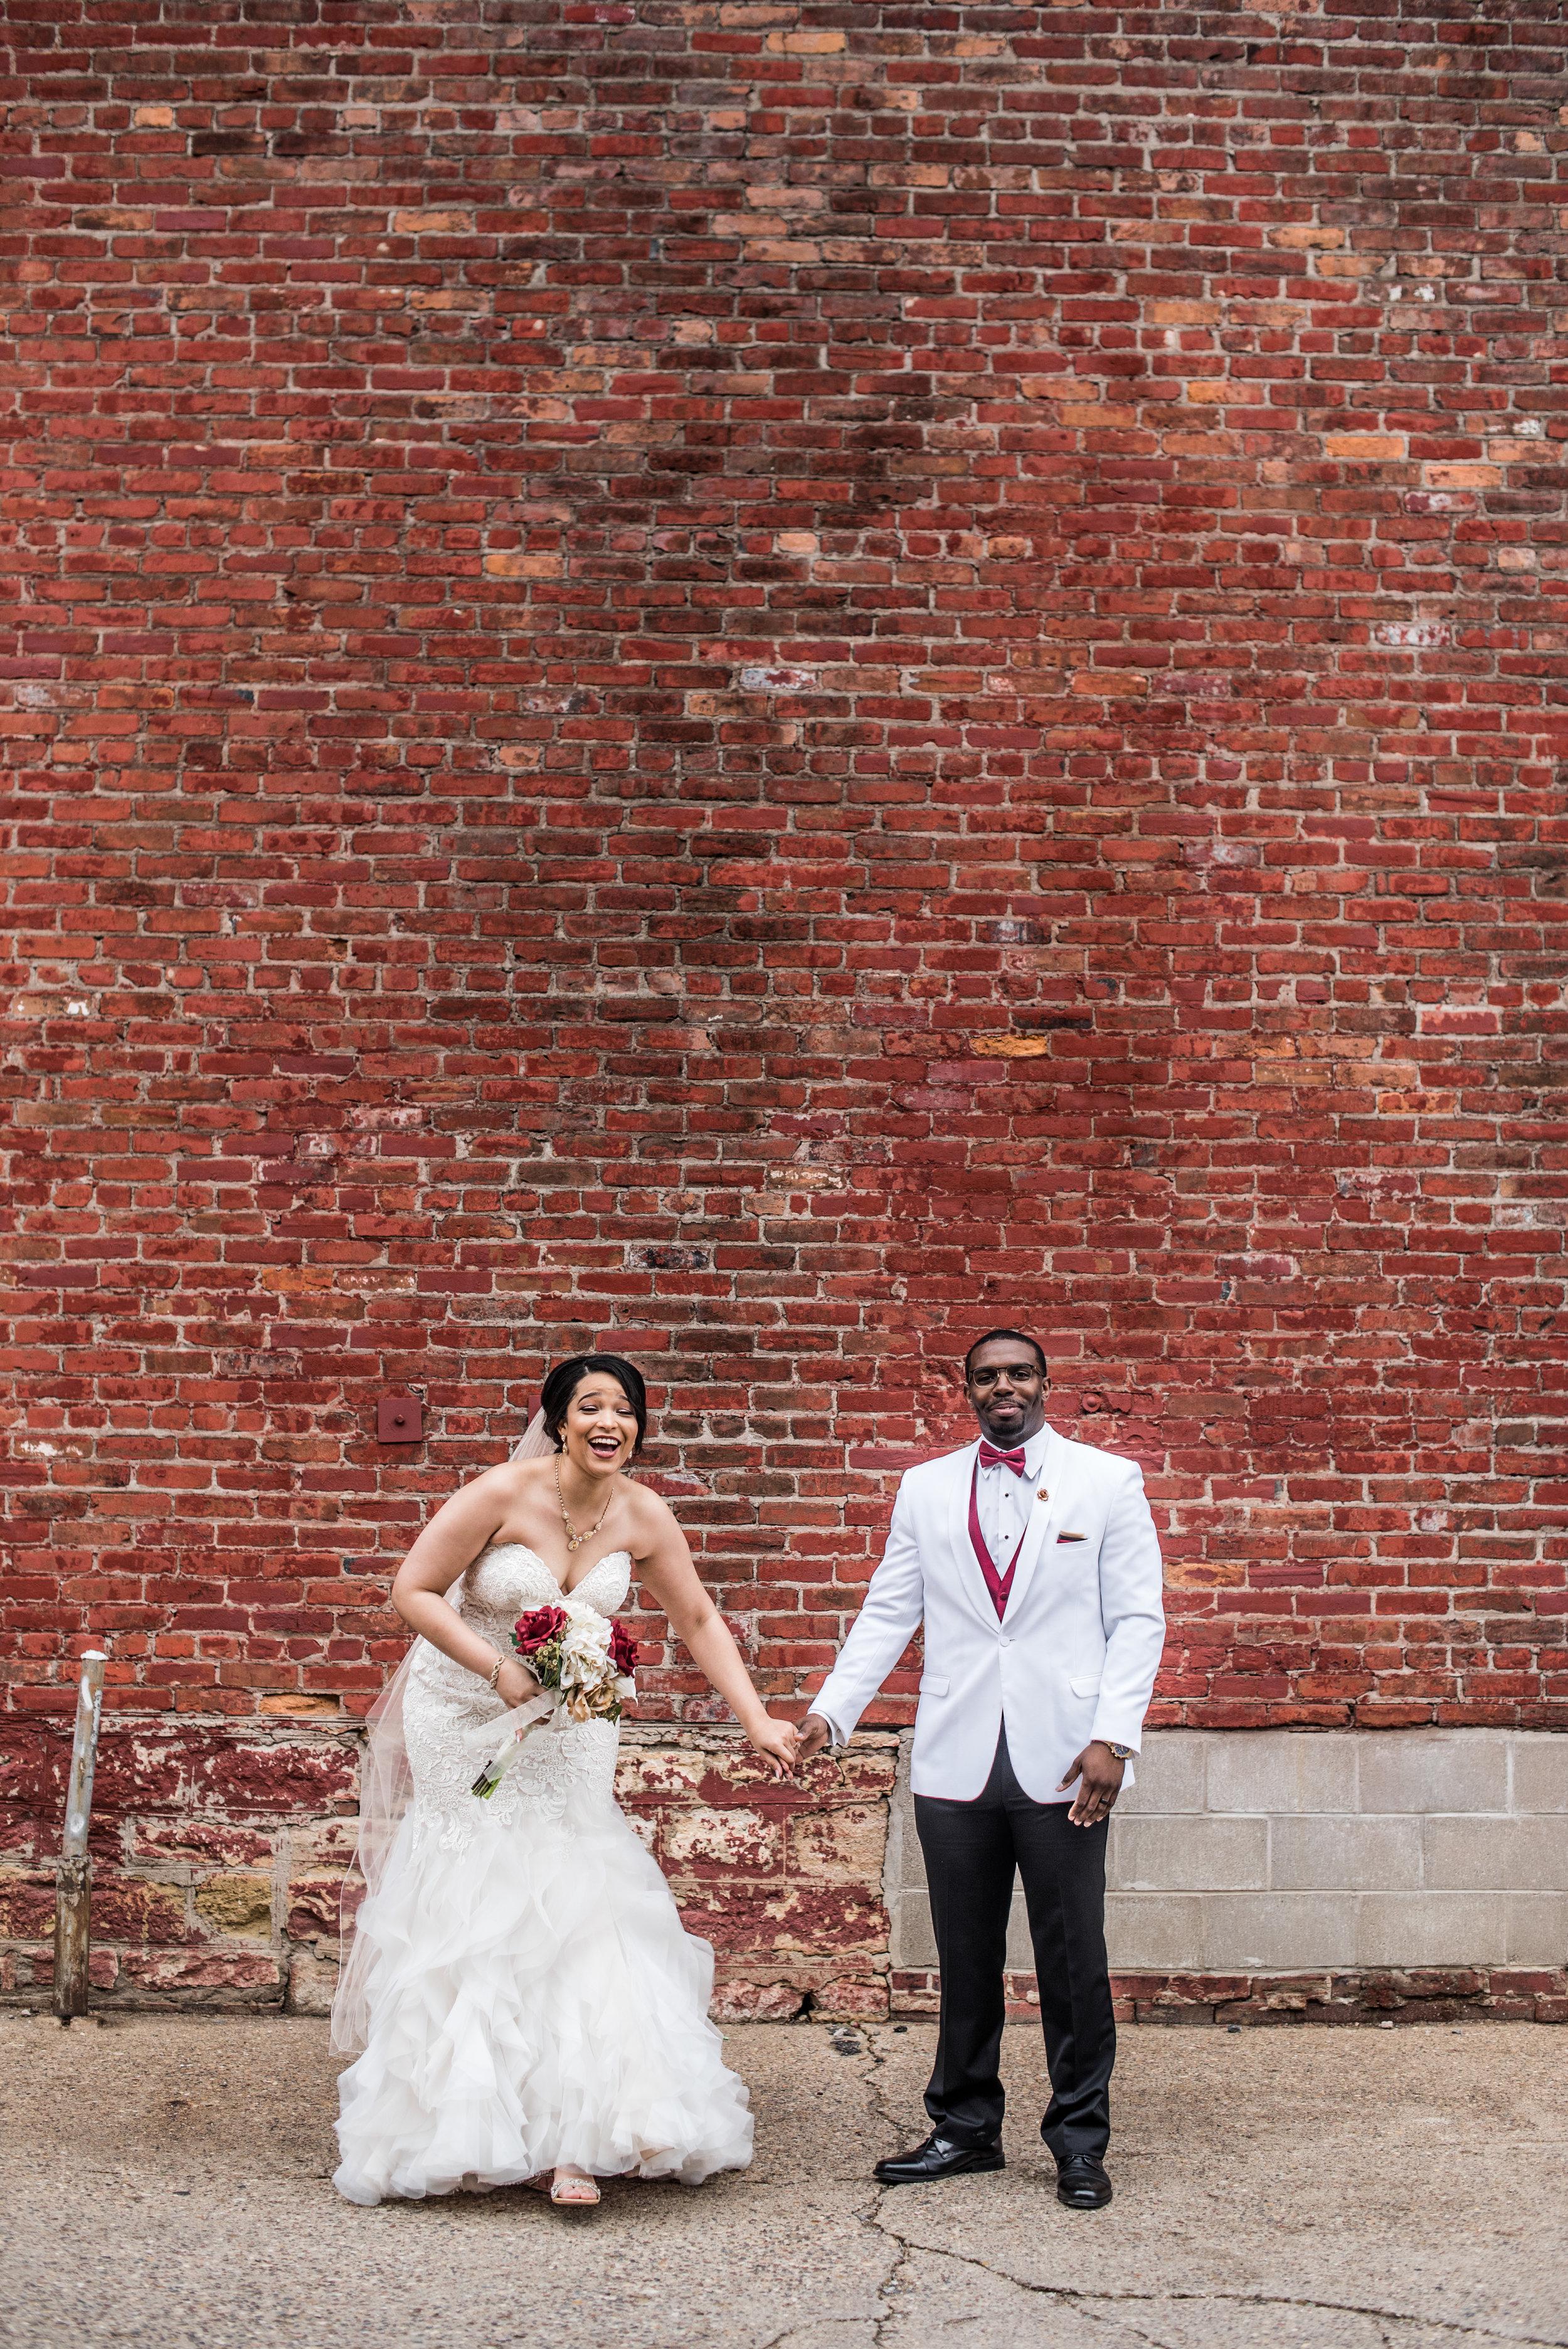 Burlington Iowa Wedding Midwest Photographer Melissa Cervantes _ Chantelle and Isaiah 243f.jpg